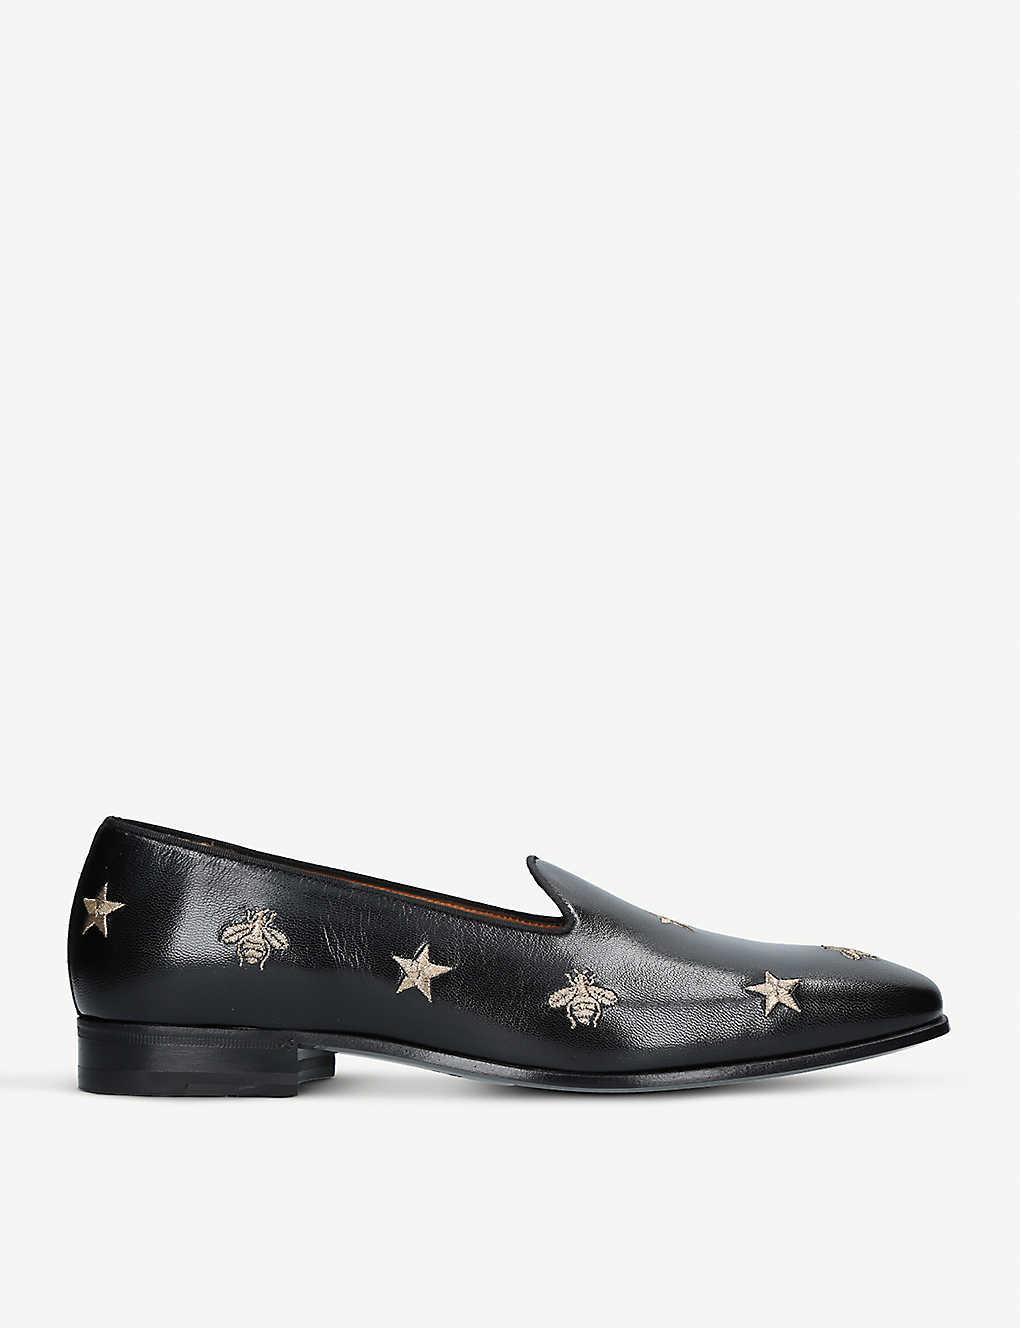 25ececa36 GUCCI - Gallipoli bee leather loafers | Selfridges.com